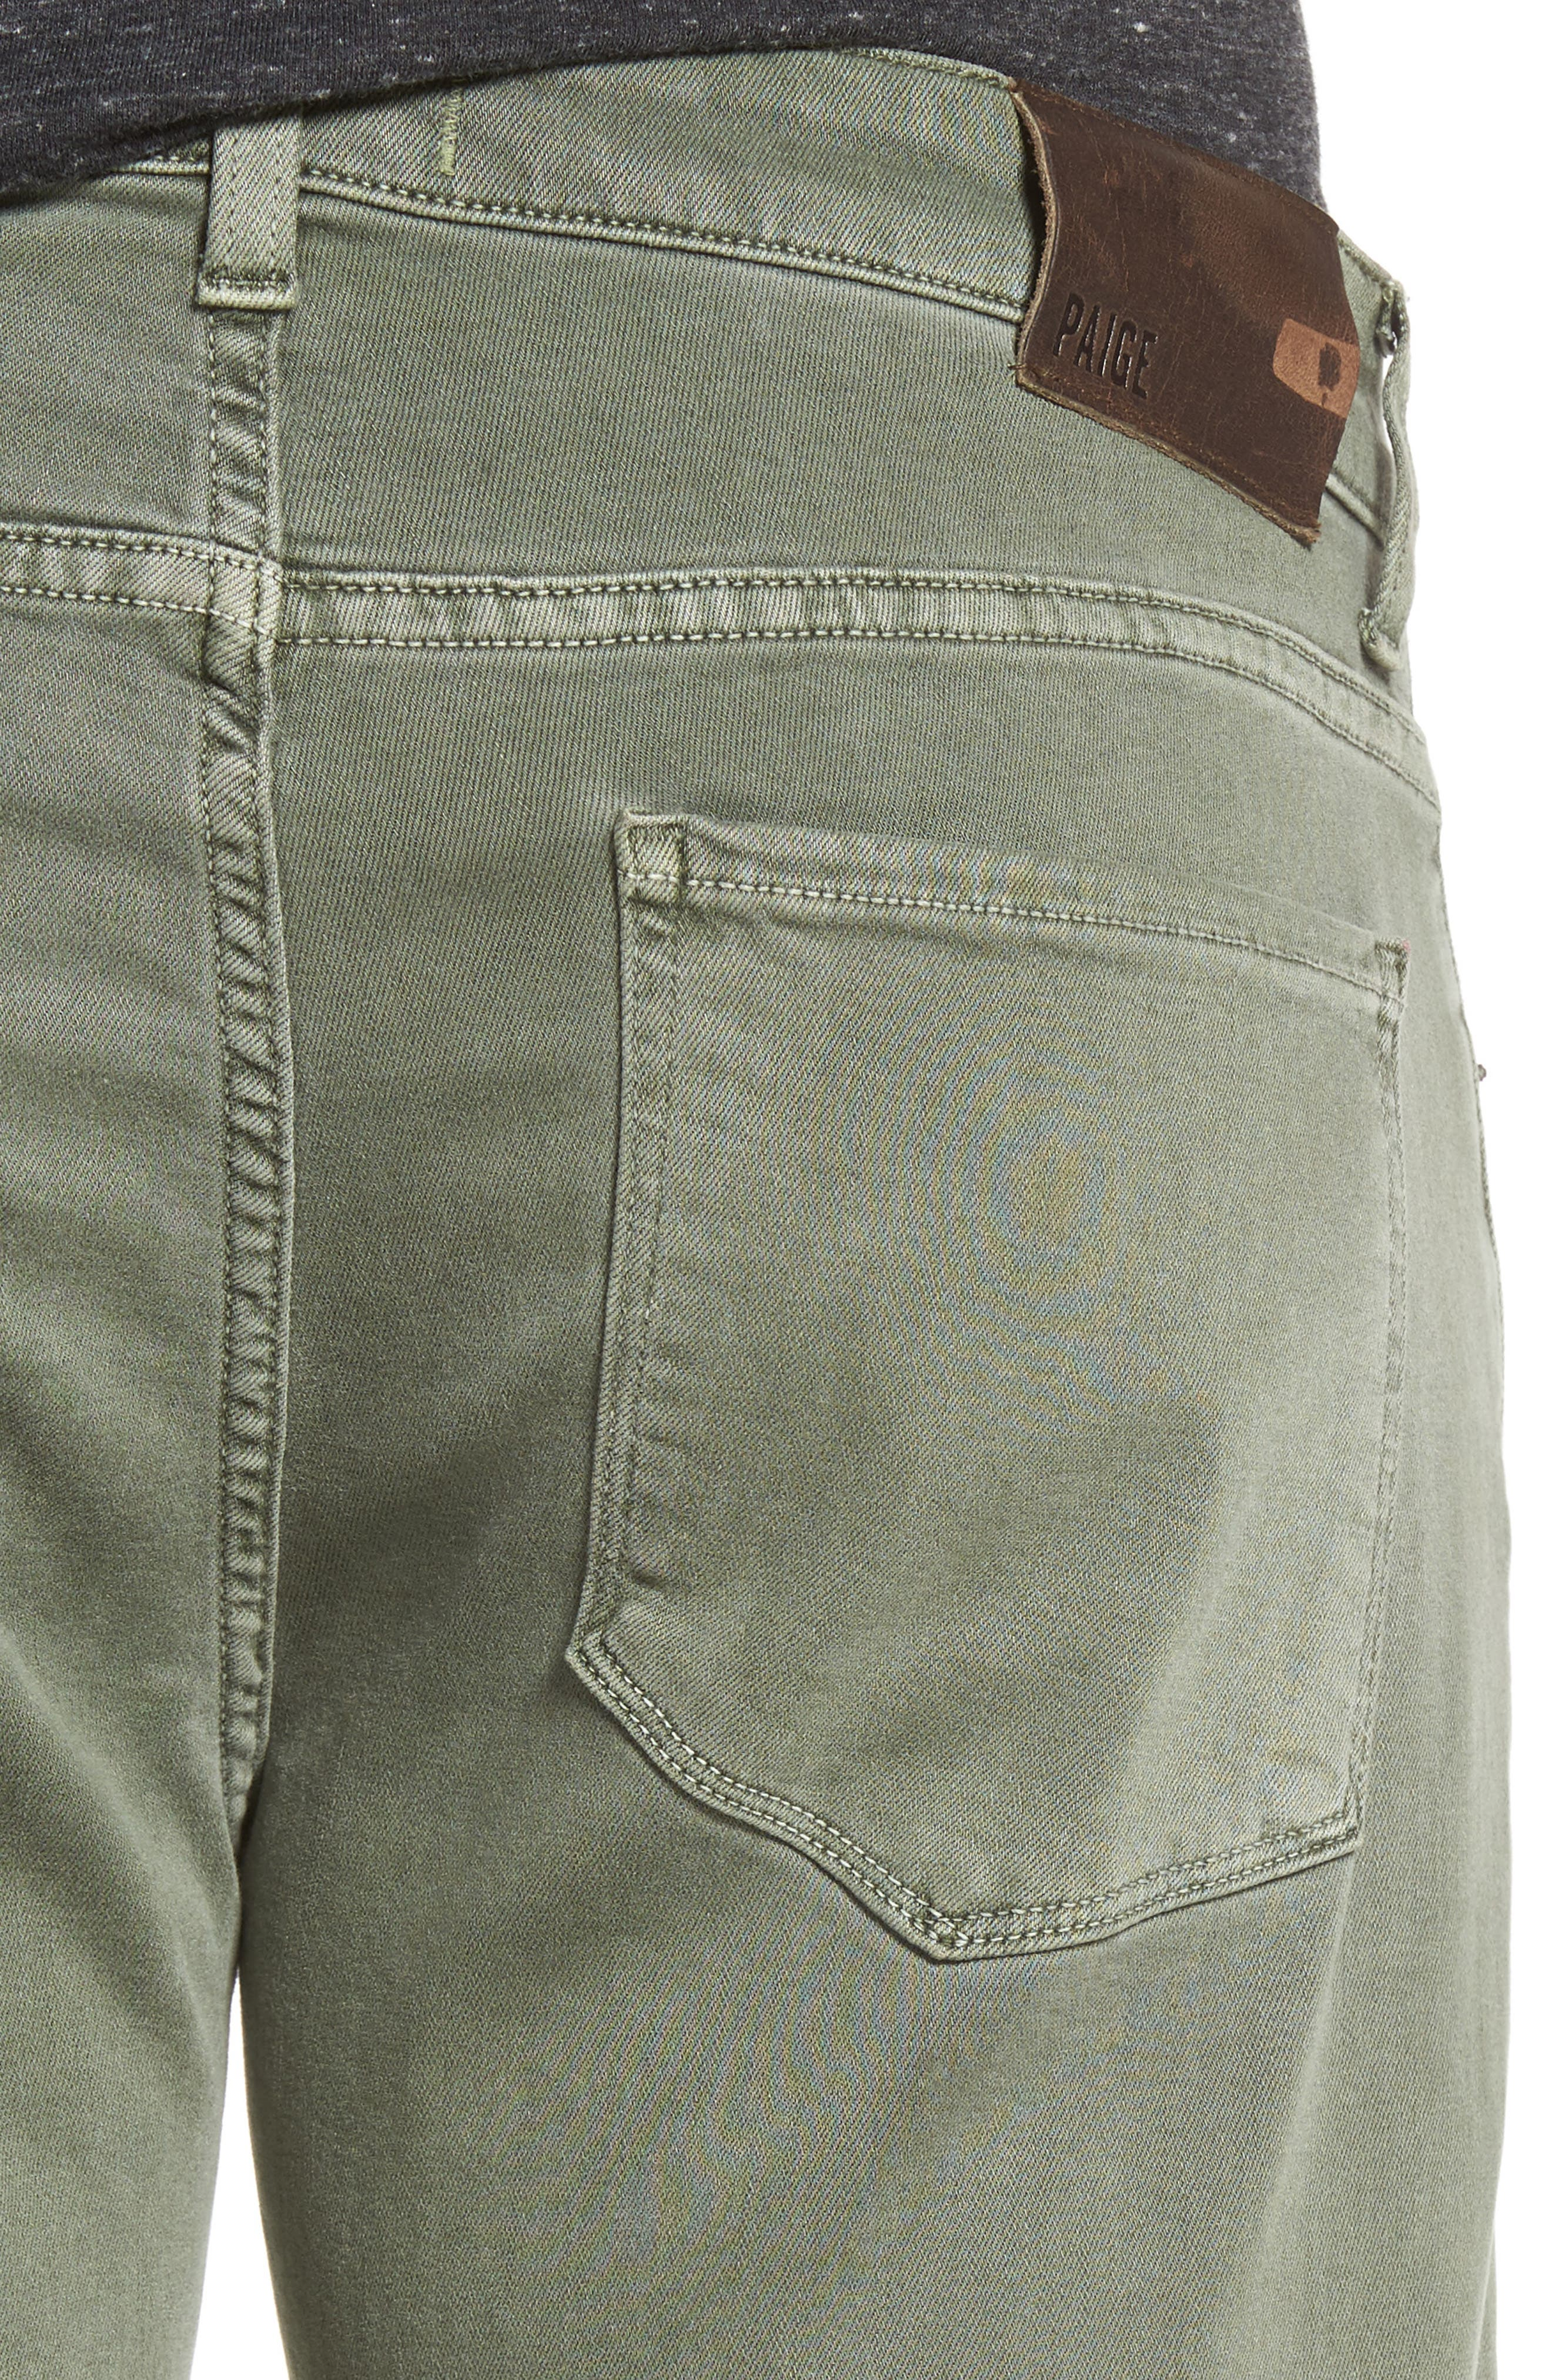 Transcend - Lennox Slim Fit Jeans,                             Alternate thumbnail 4, color,